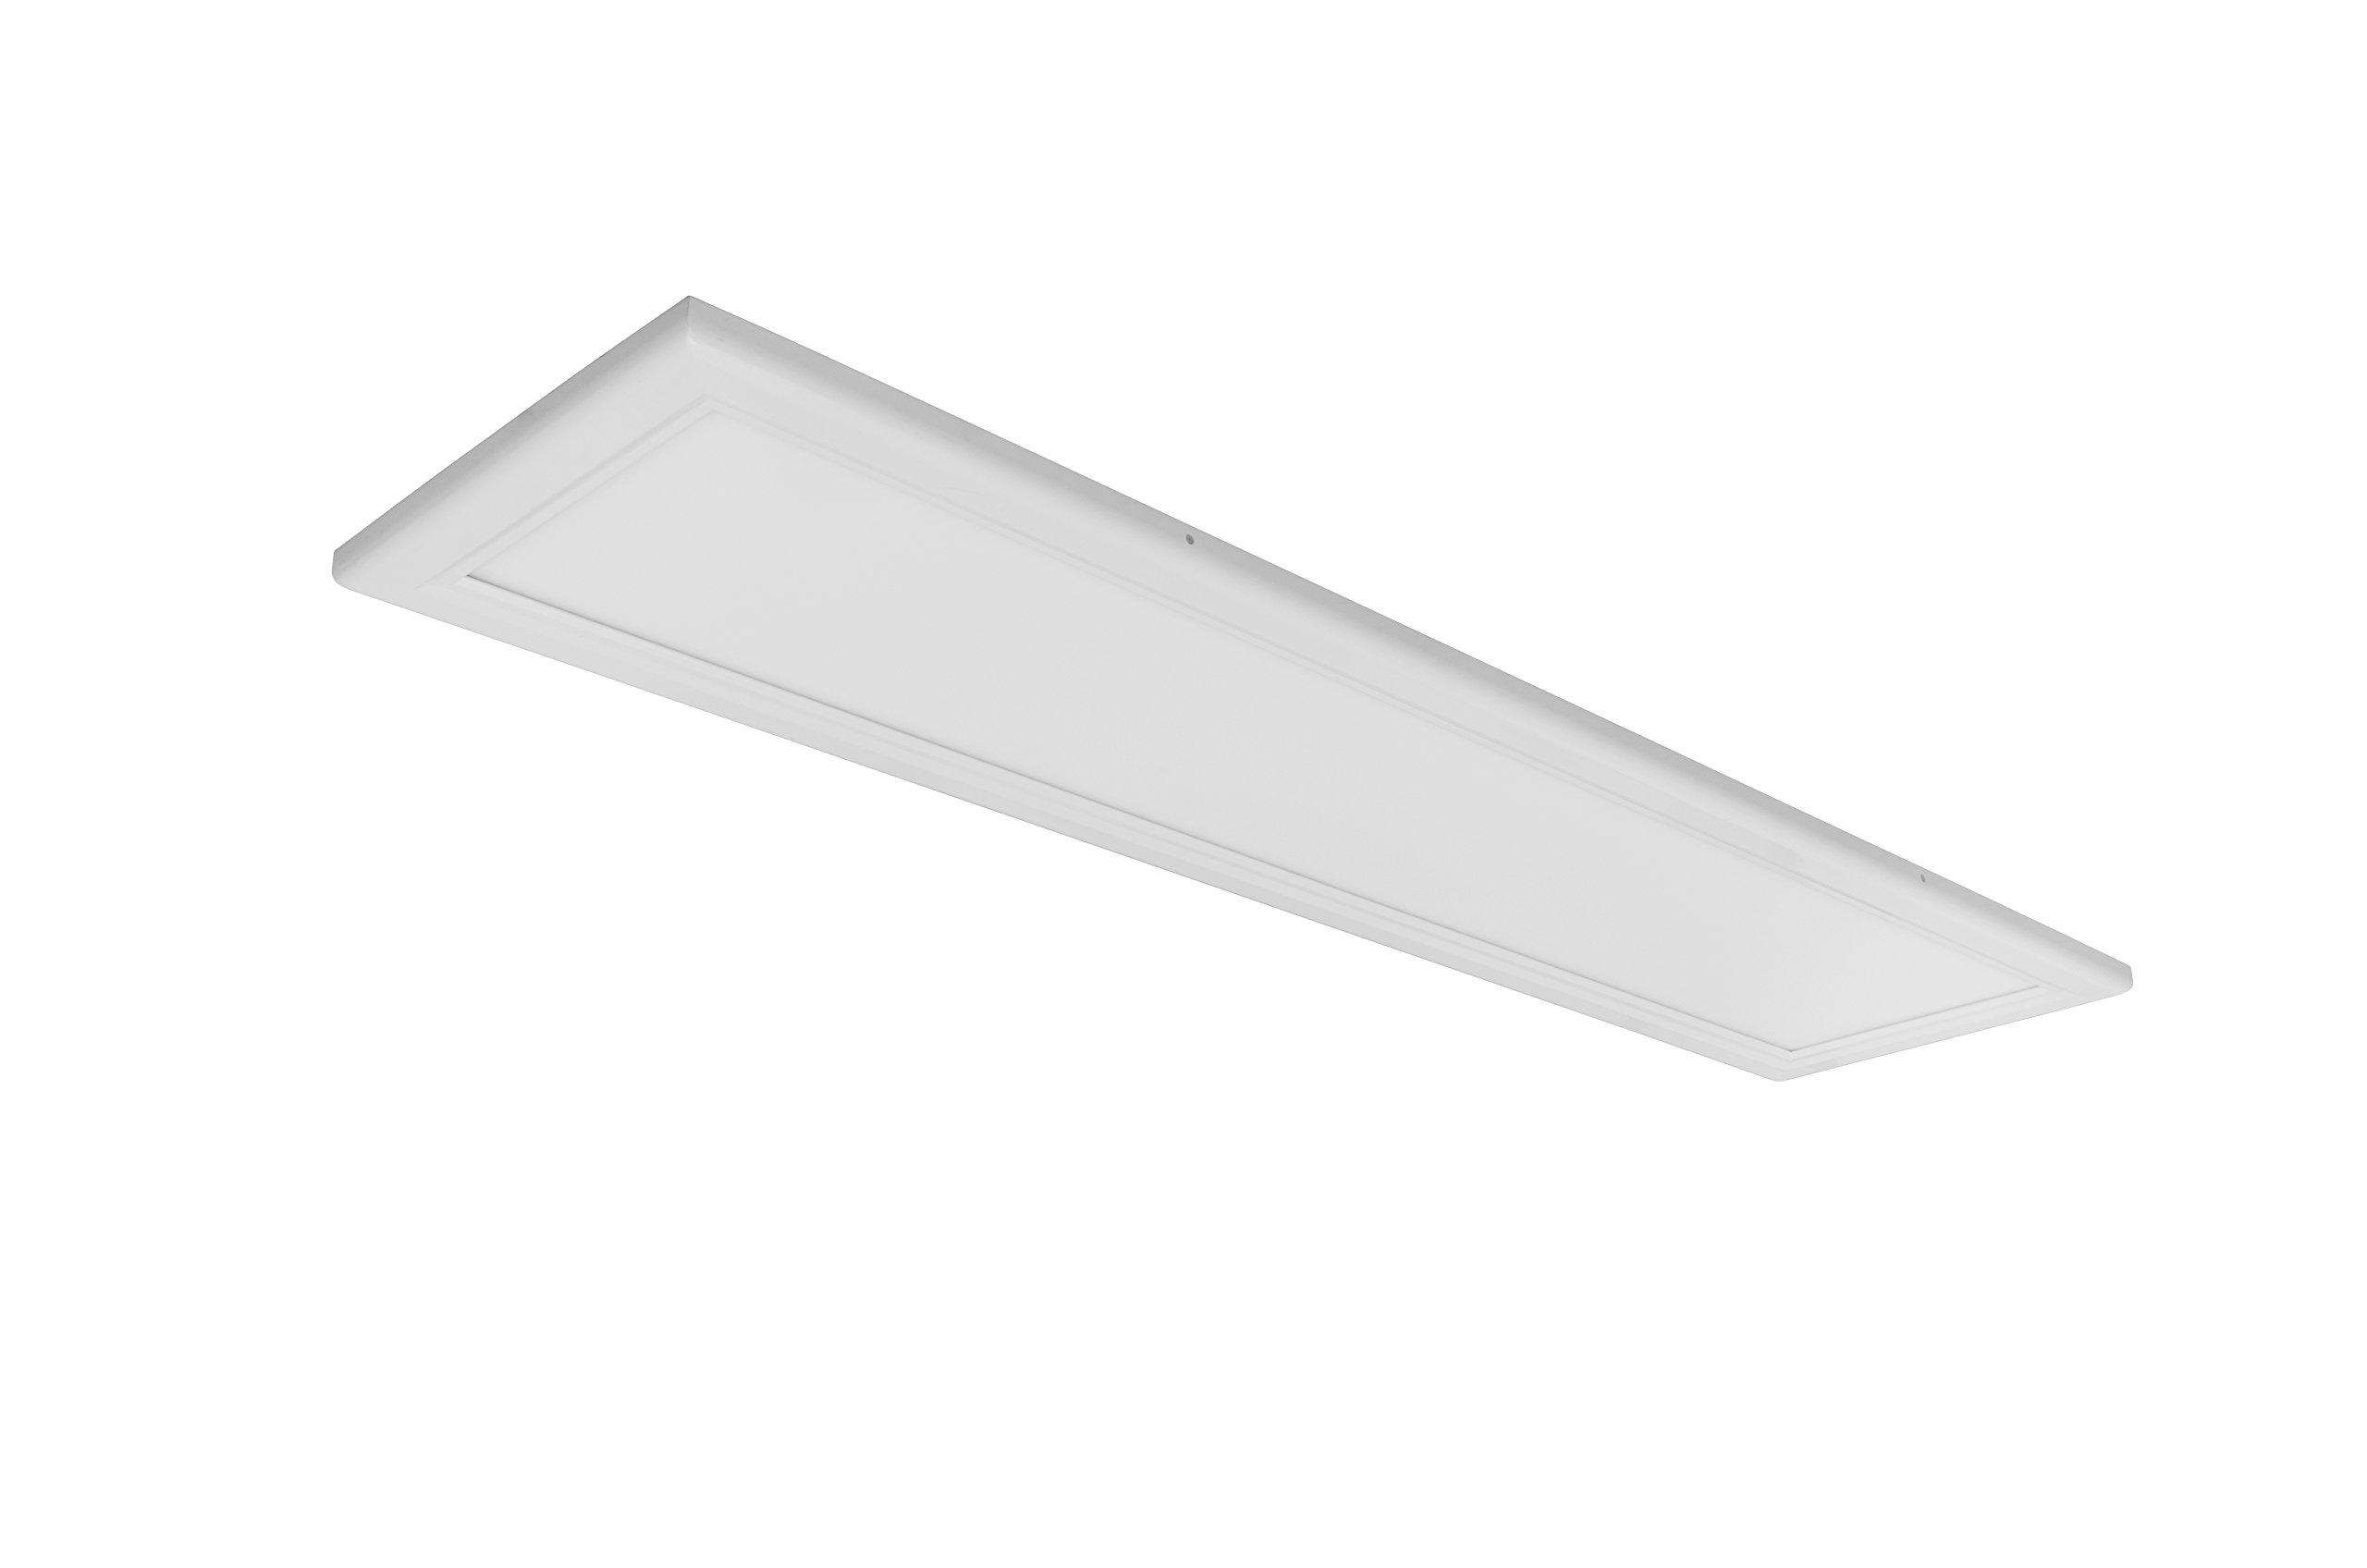 Inti Lighting 1'x4' Dimmable 50 Watt LED Flush Mount Troffer Flat Panel Light 4000K Bright White